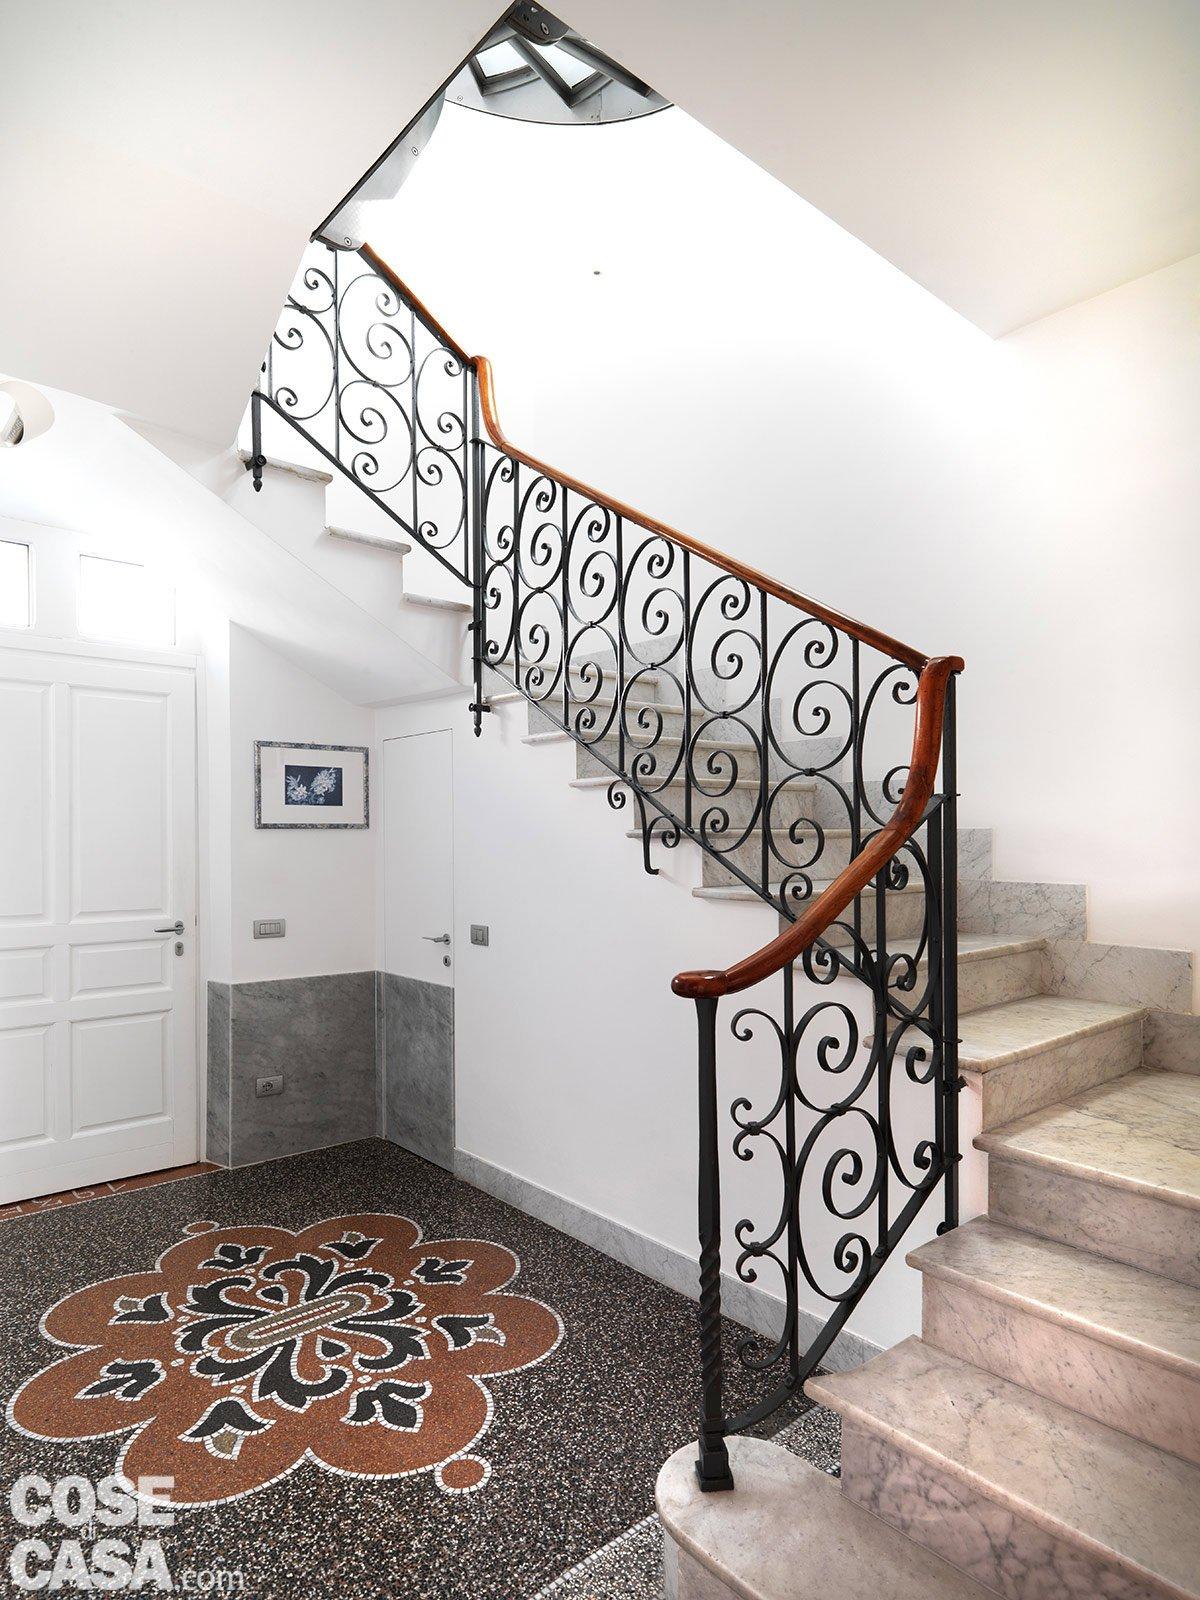 Casa soluzioni hi tech per interni anni 39 30 cose di casa for Muri interni decorati